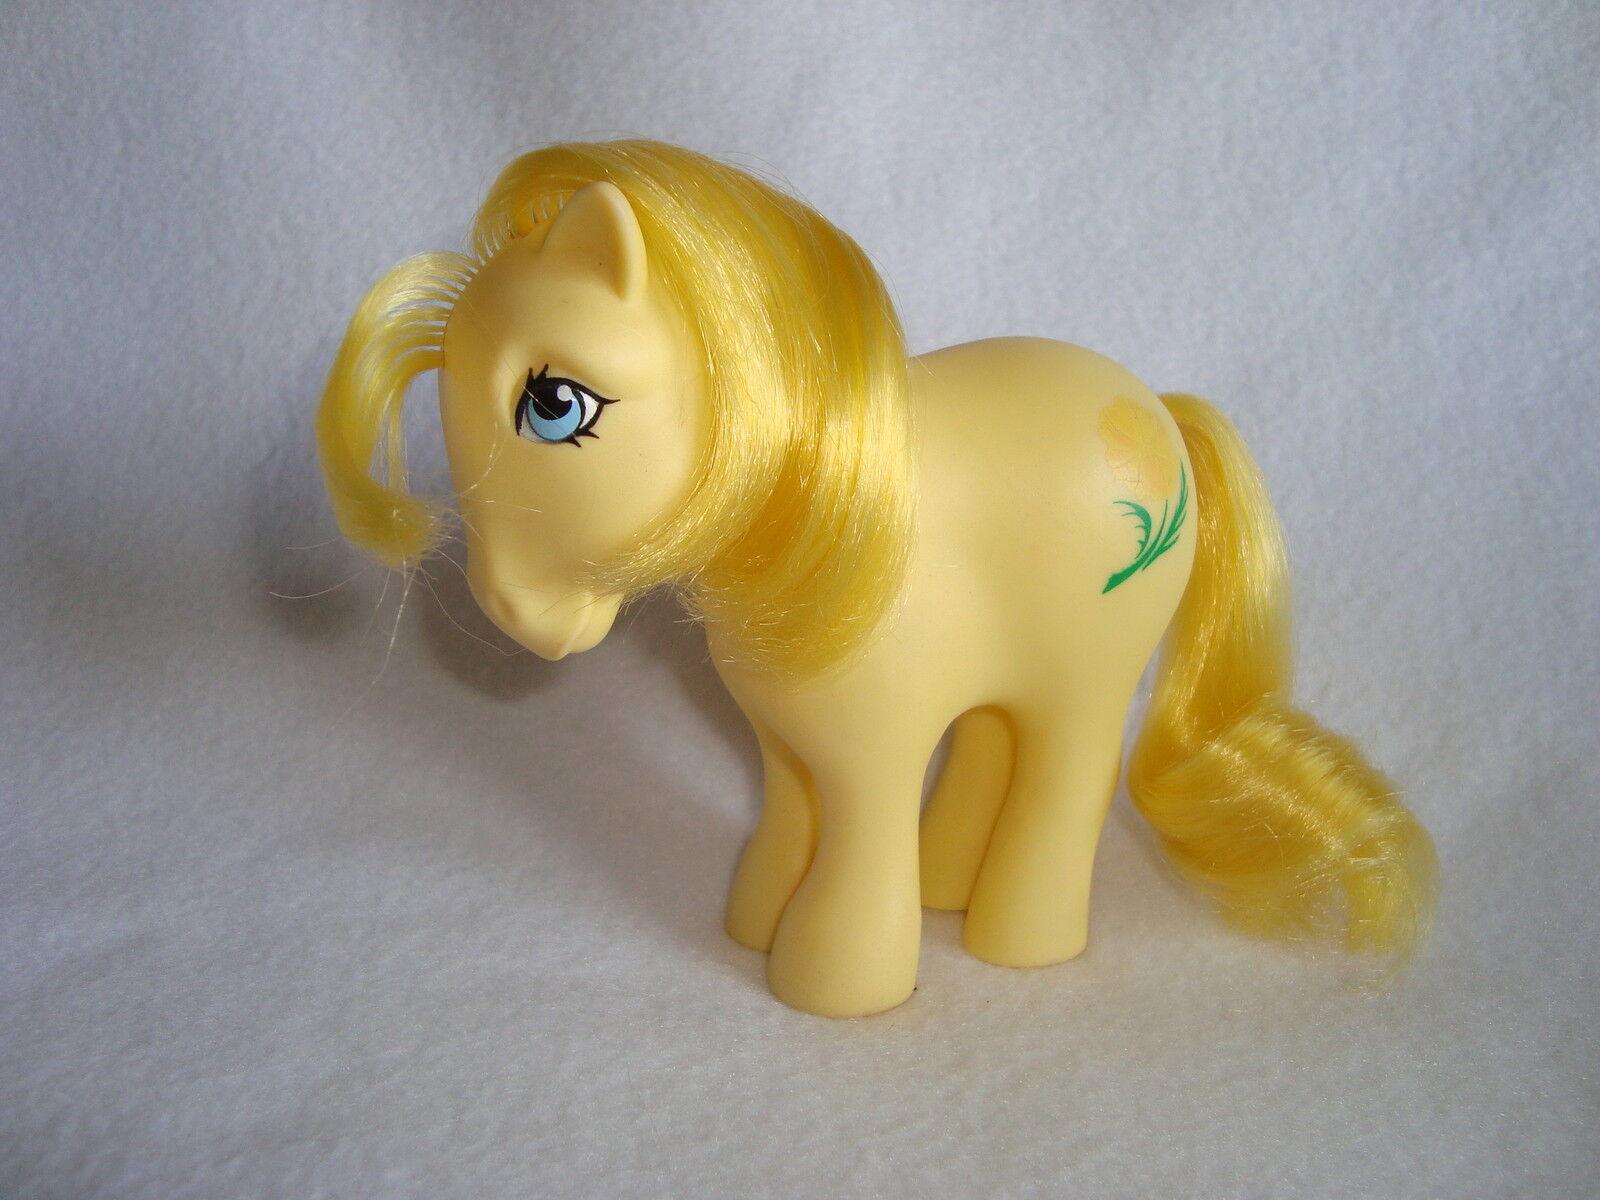 Cosmos Mail Order Australia Nirvana Mio Mini Pony My Little Pony SPESE GRATIS